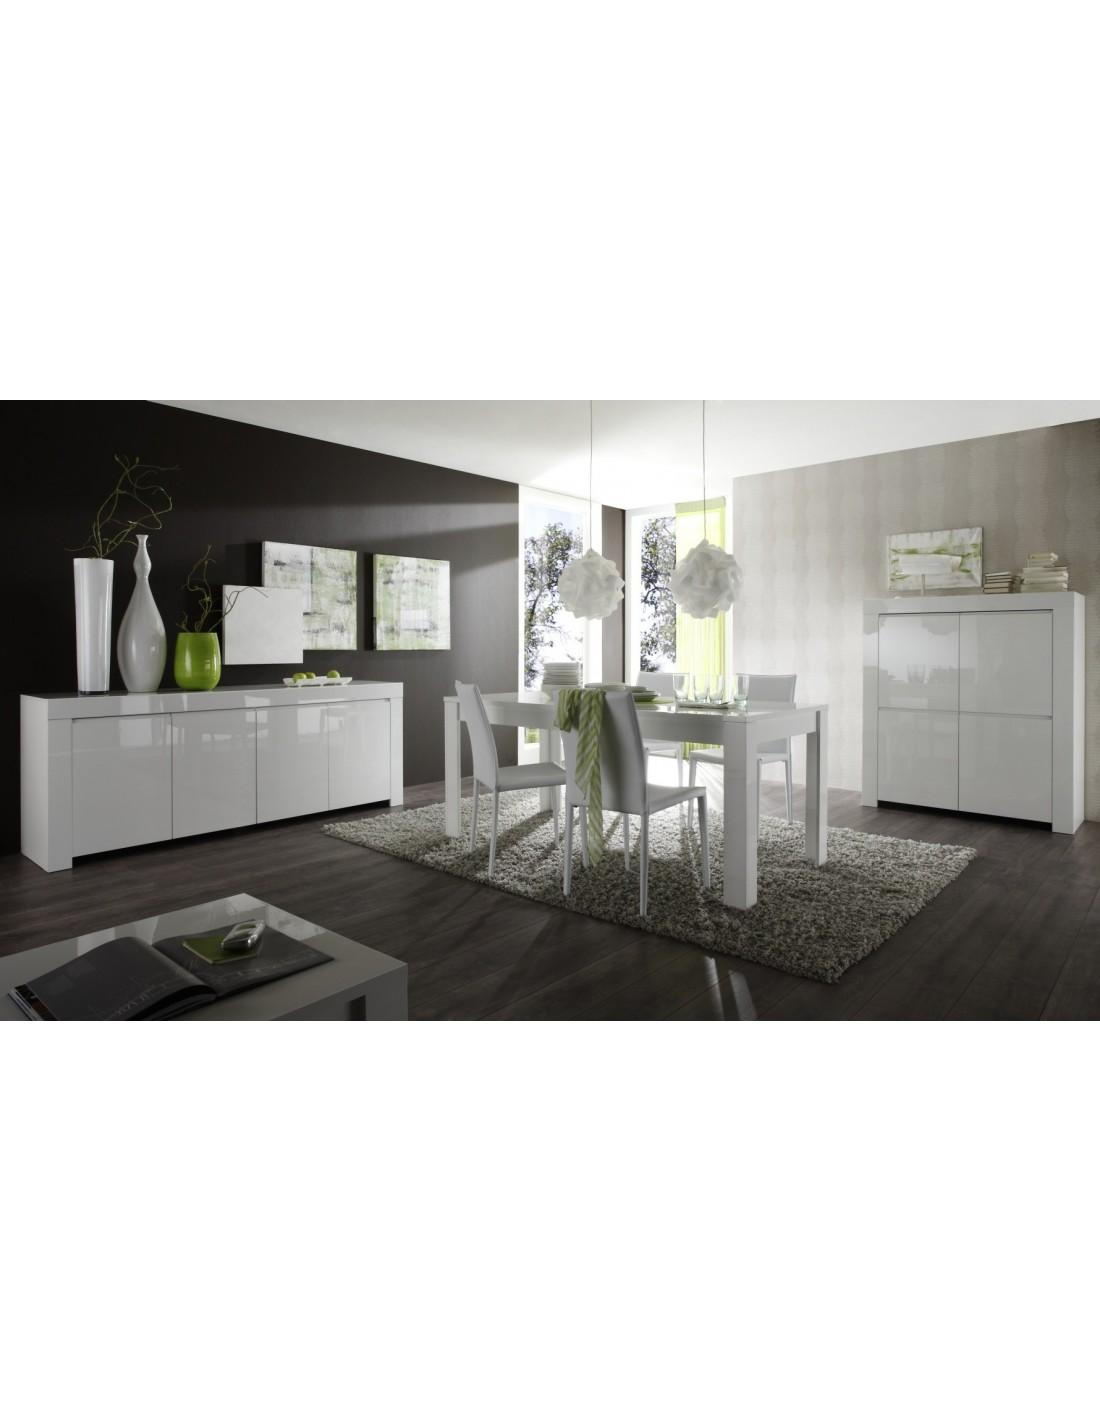 Meuble 4 portes Laqué Blanc Brillant - Amalfi - My Mobili